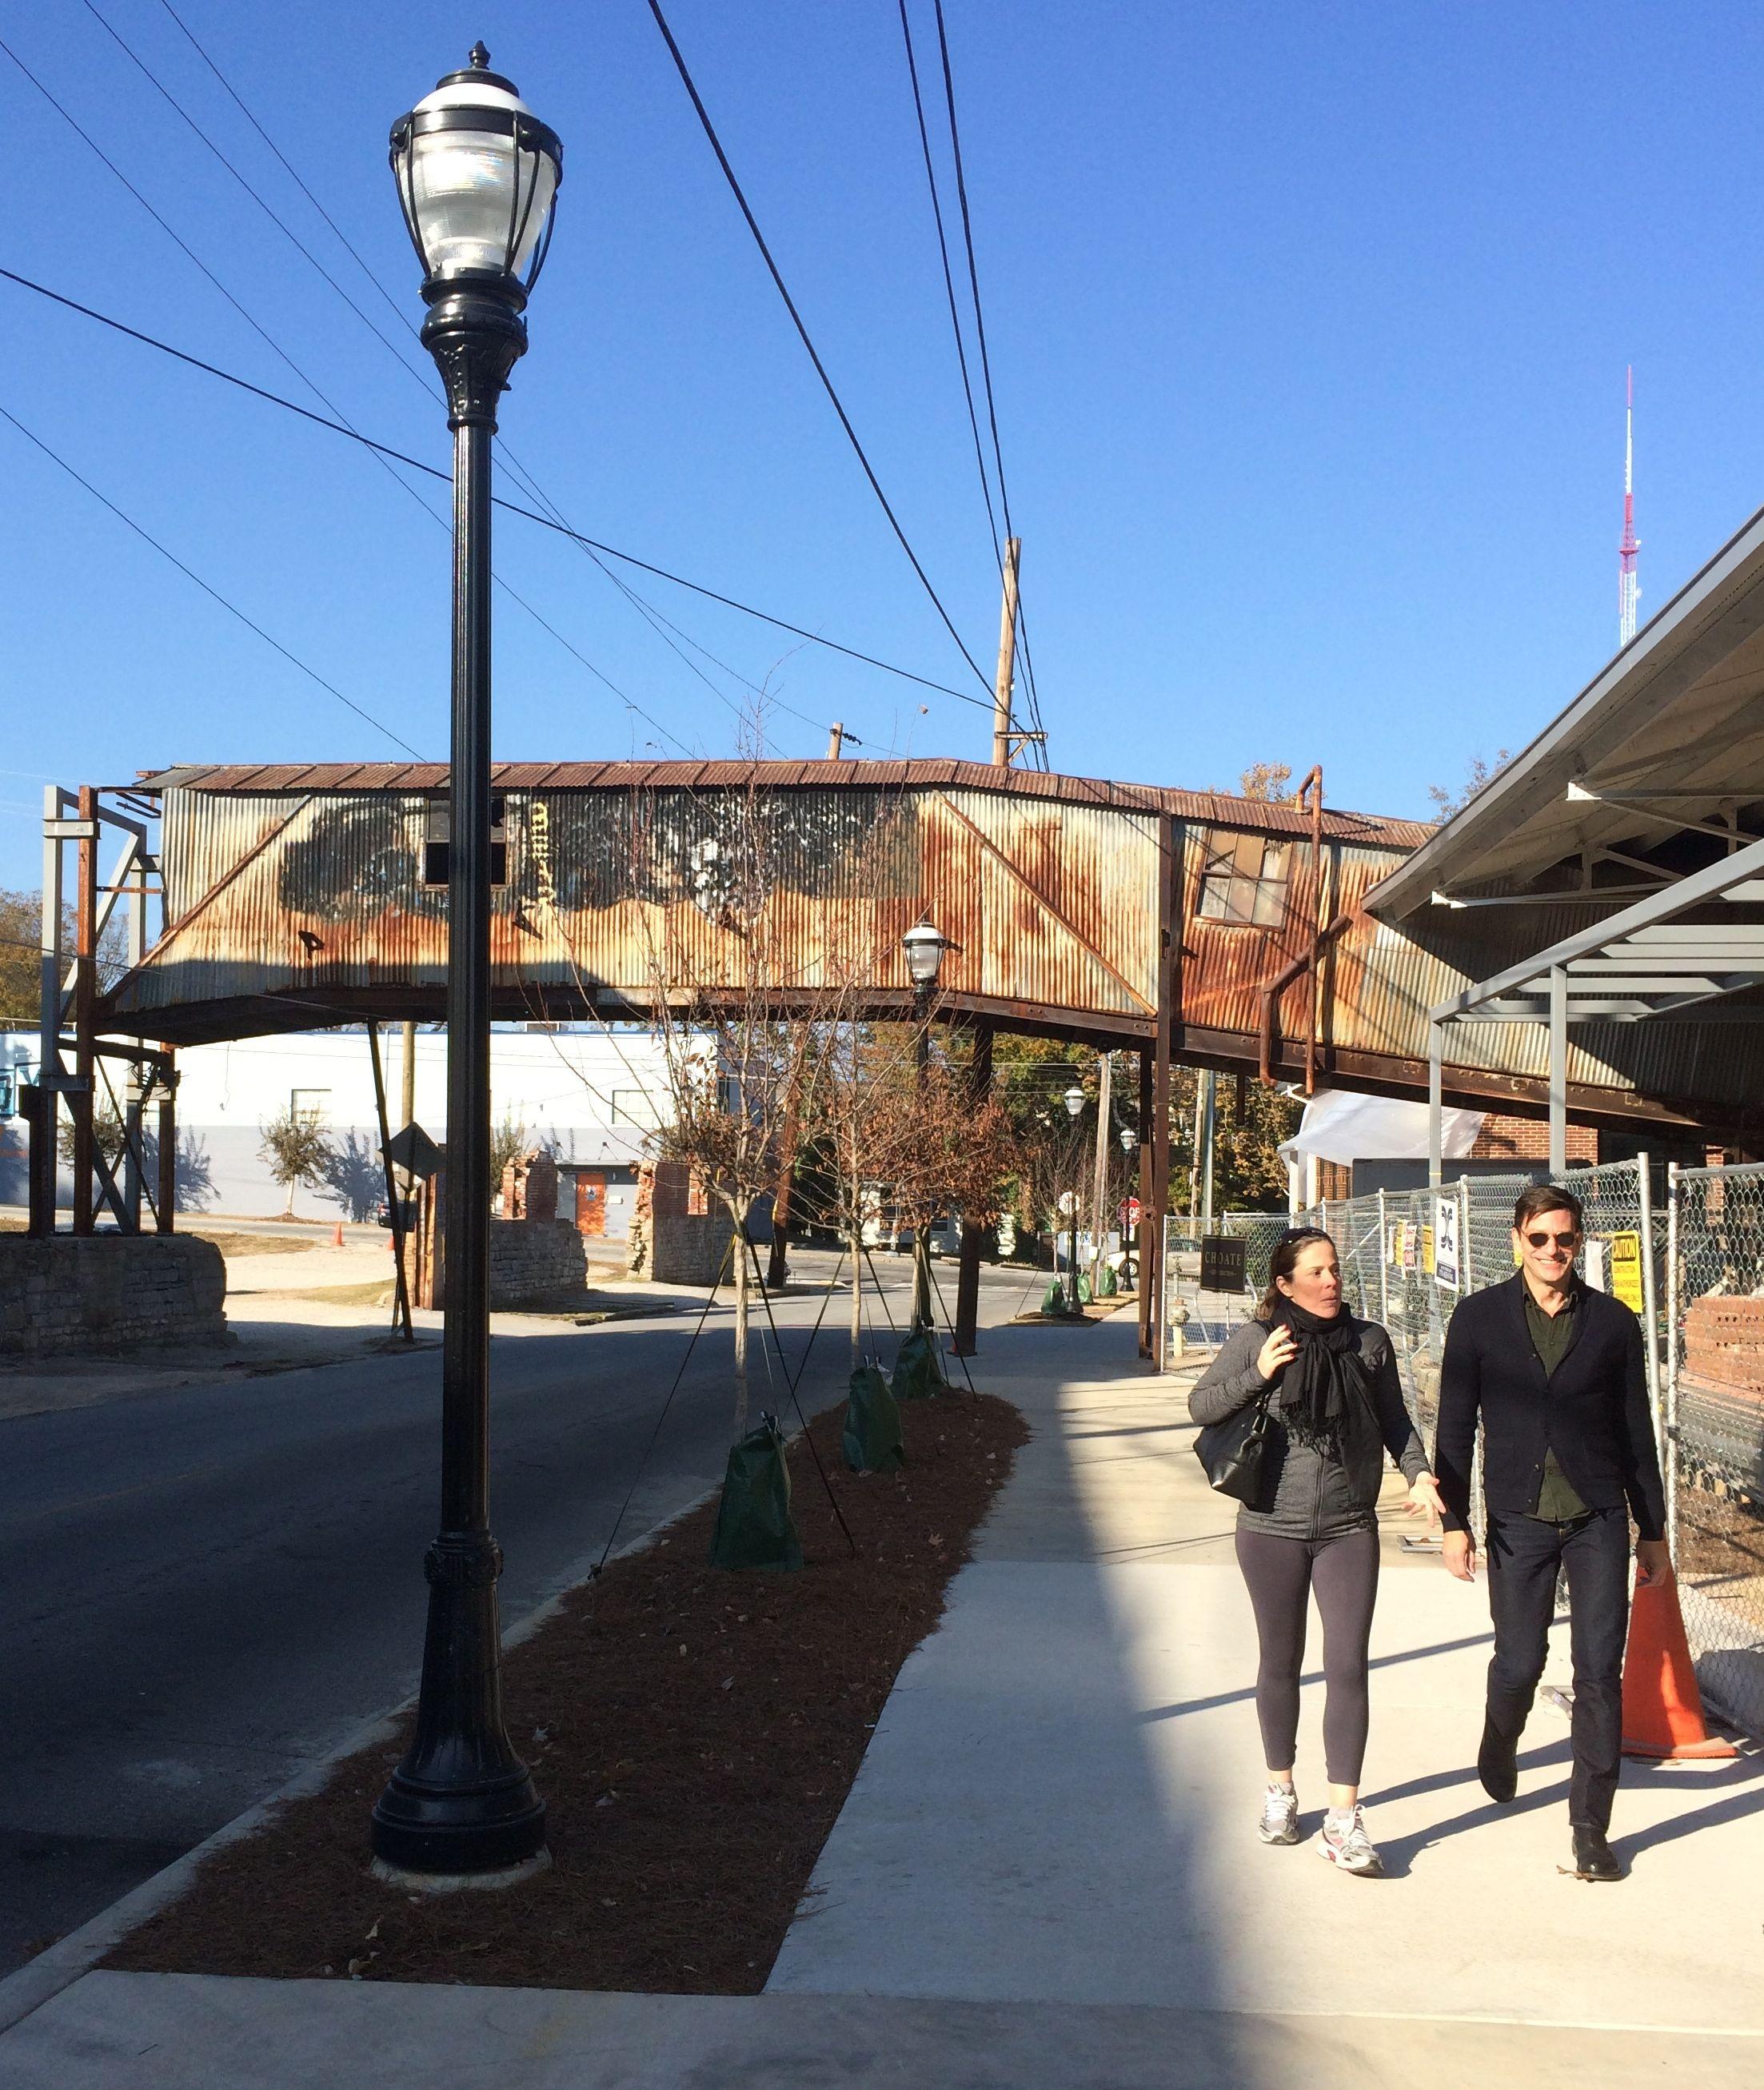 Folks Restaurant Atlanta: Krog Street Market Continues Atlanta's Intown